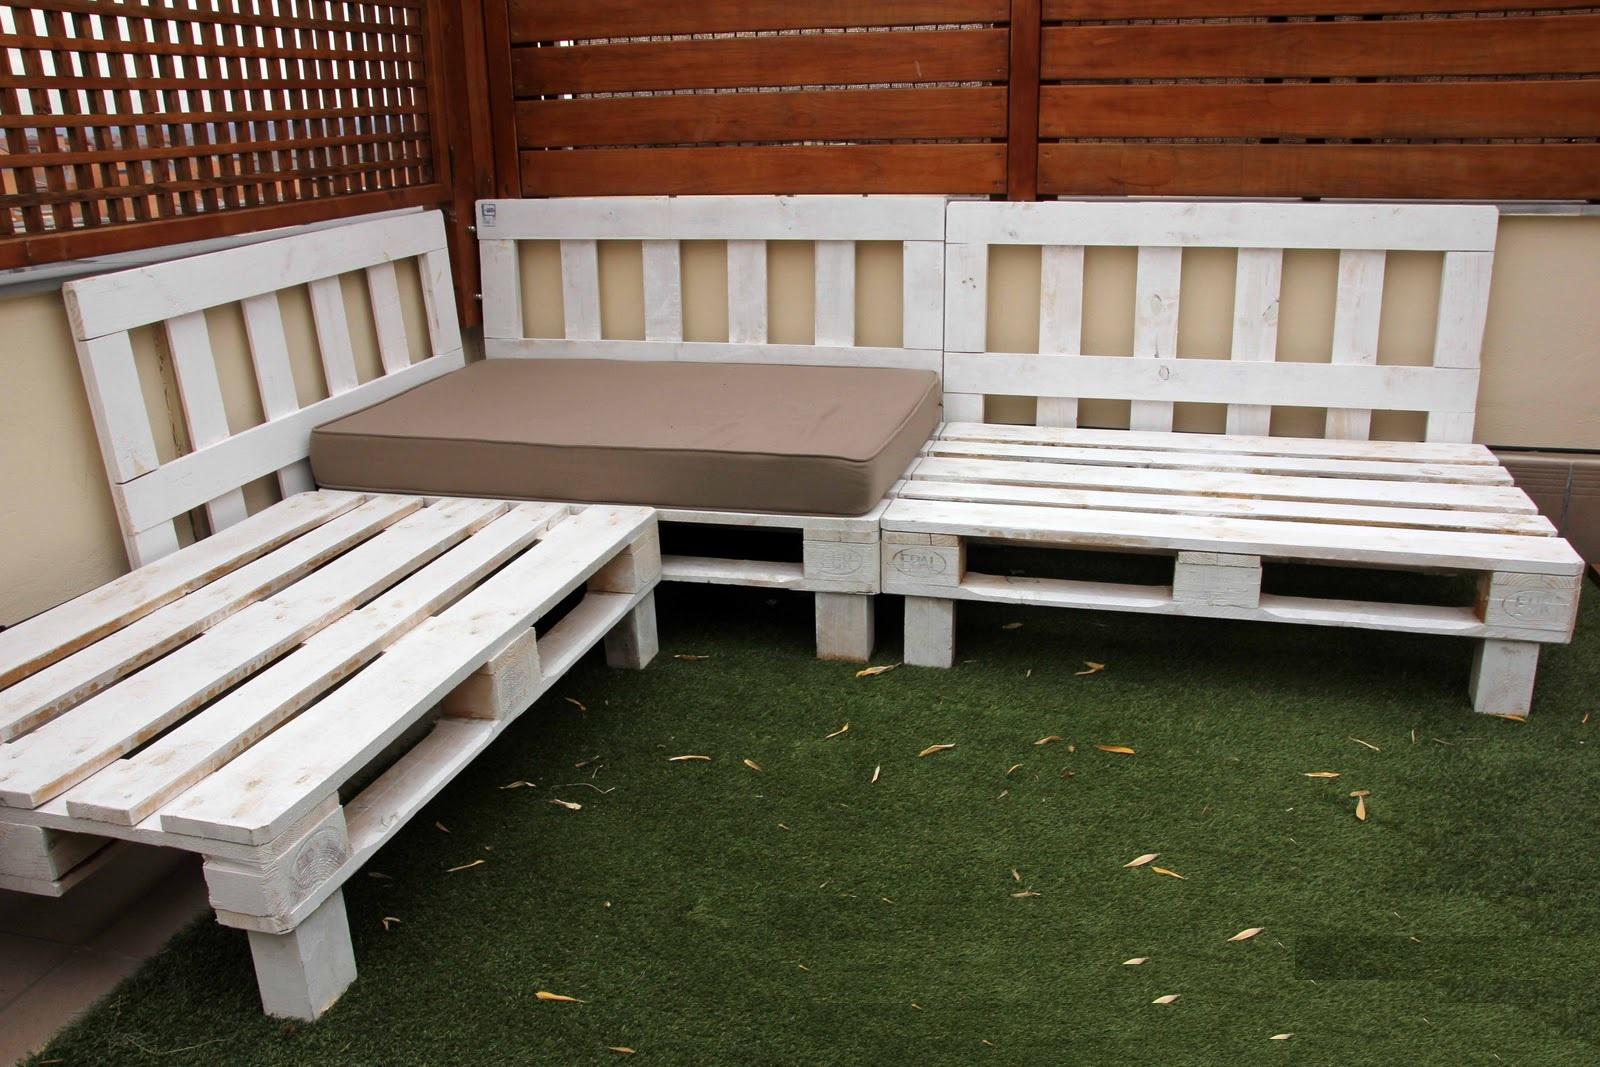 Muebles malee muebles ecologicos madera renovada - Hacer sillones con palets ...